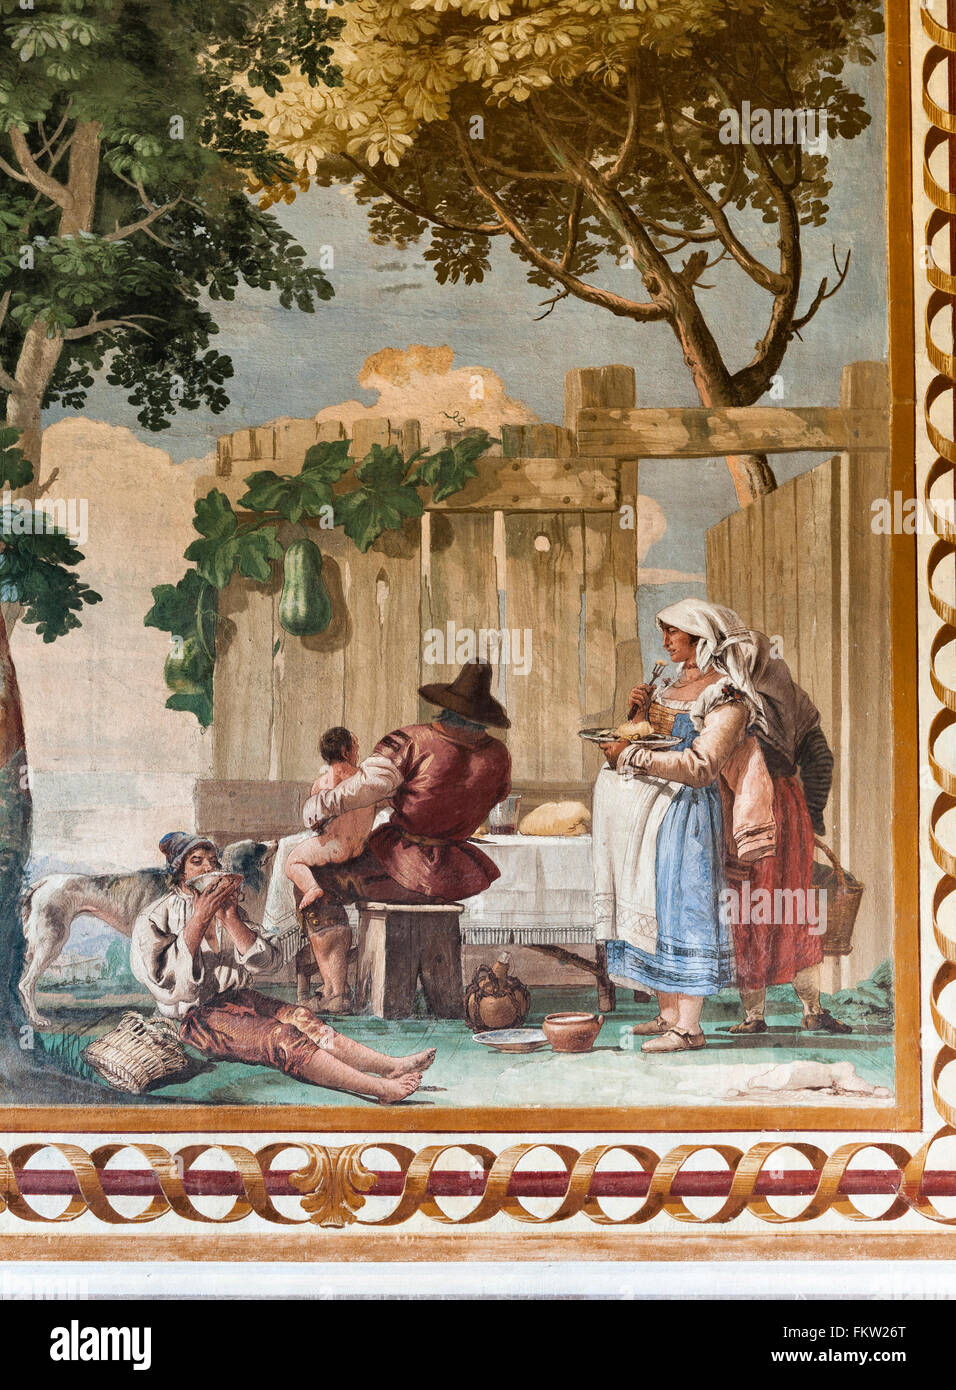 Villa Valmarana ai Nani, Italy. Fresco by Giandomenico Tiepolo in the Foresteria (guesthouse). Family Meal - Stock Image